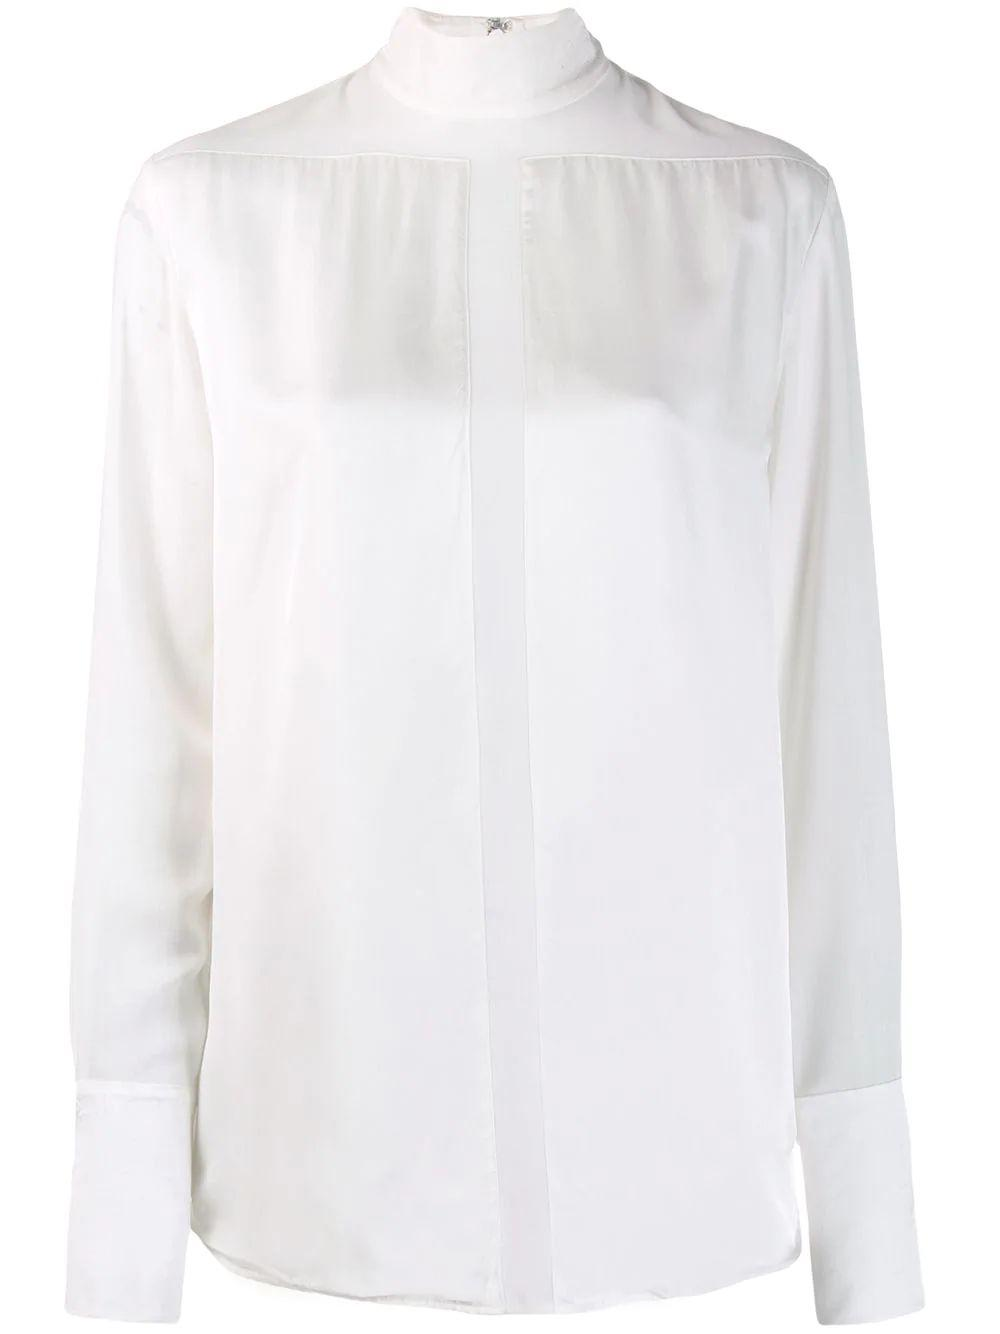 Long Sleeve Satin Sheer Panel Blouse Item # 2419WTP000182A